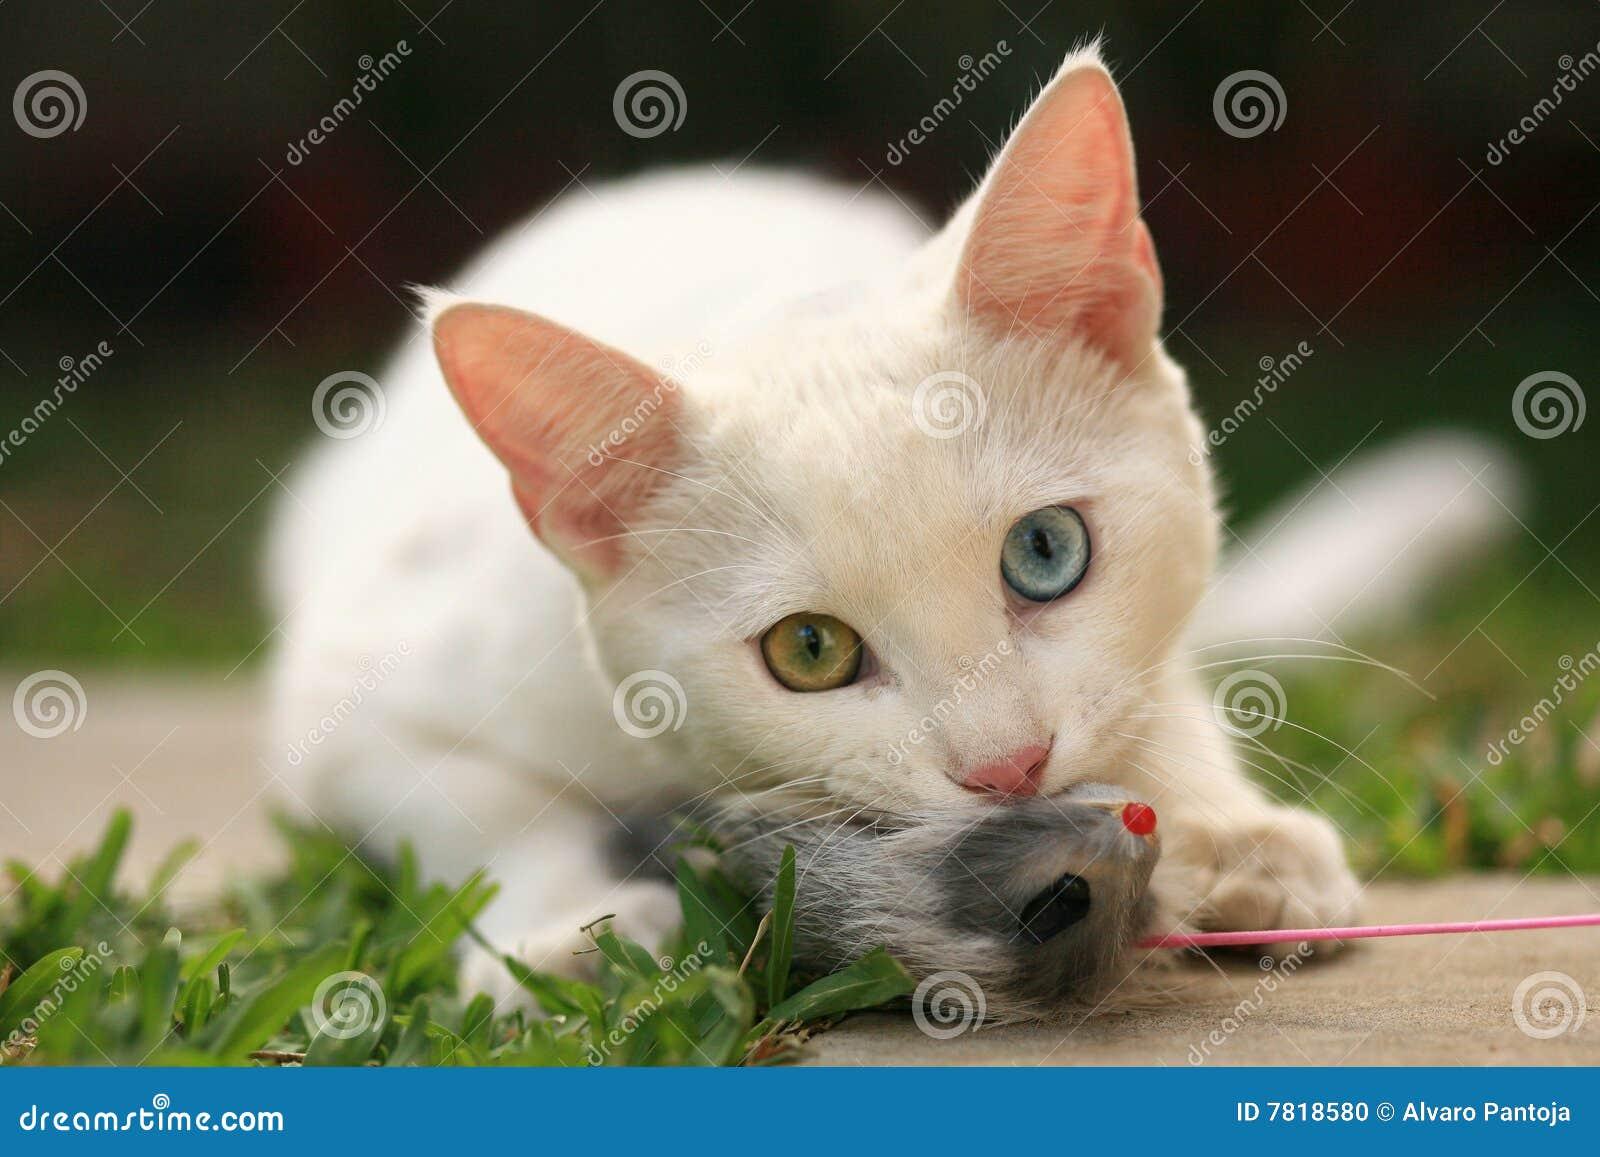 White Cat Rat Meme